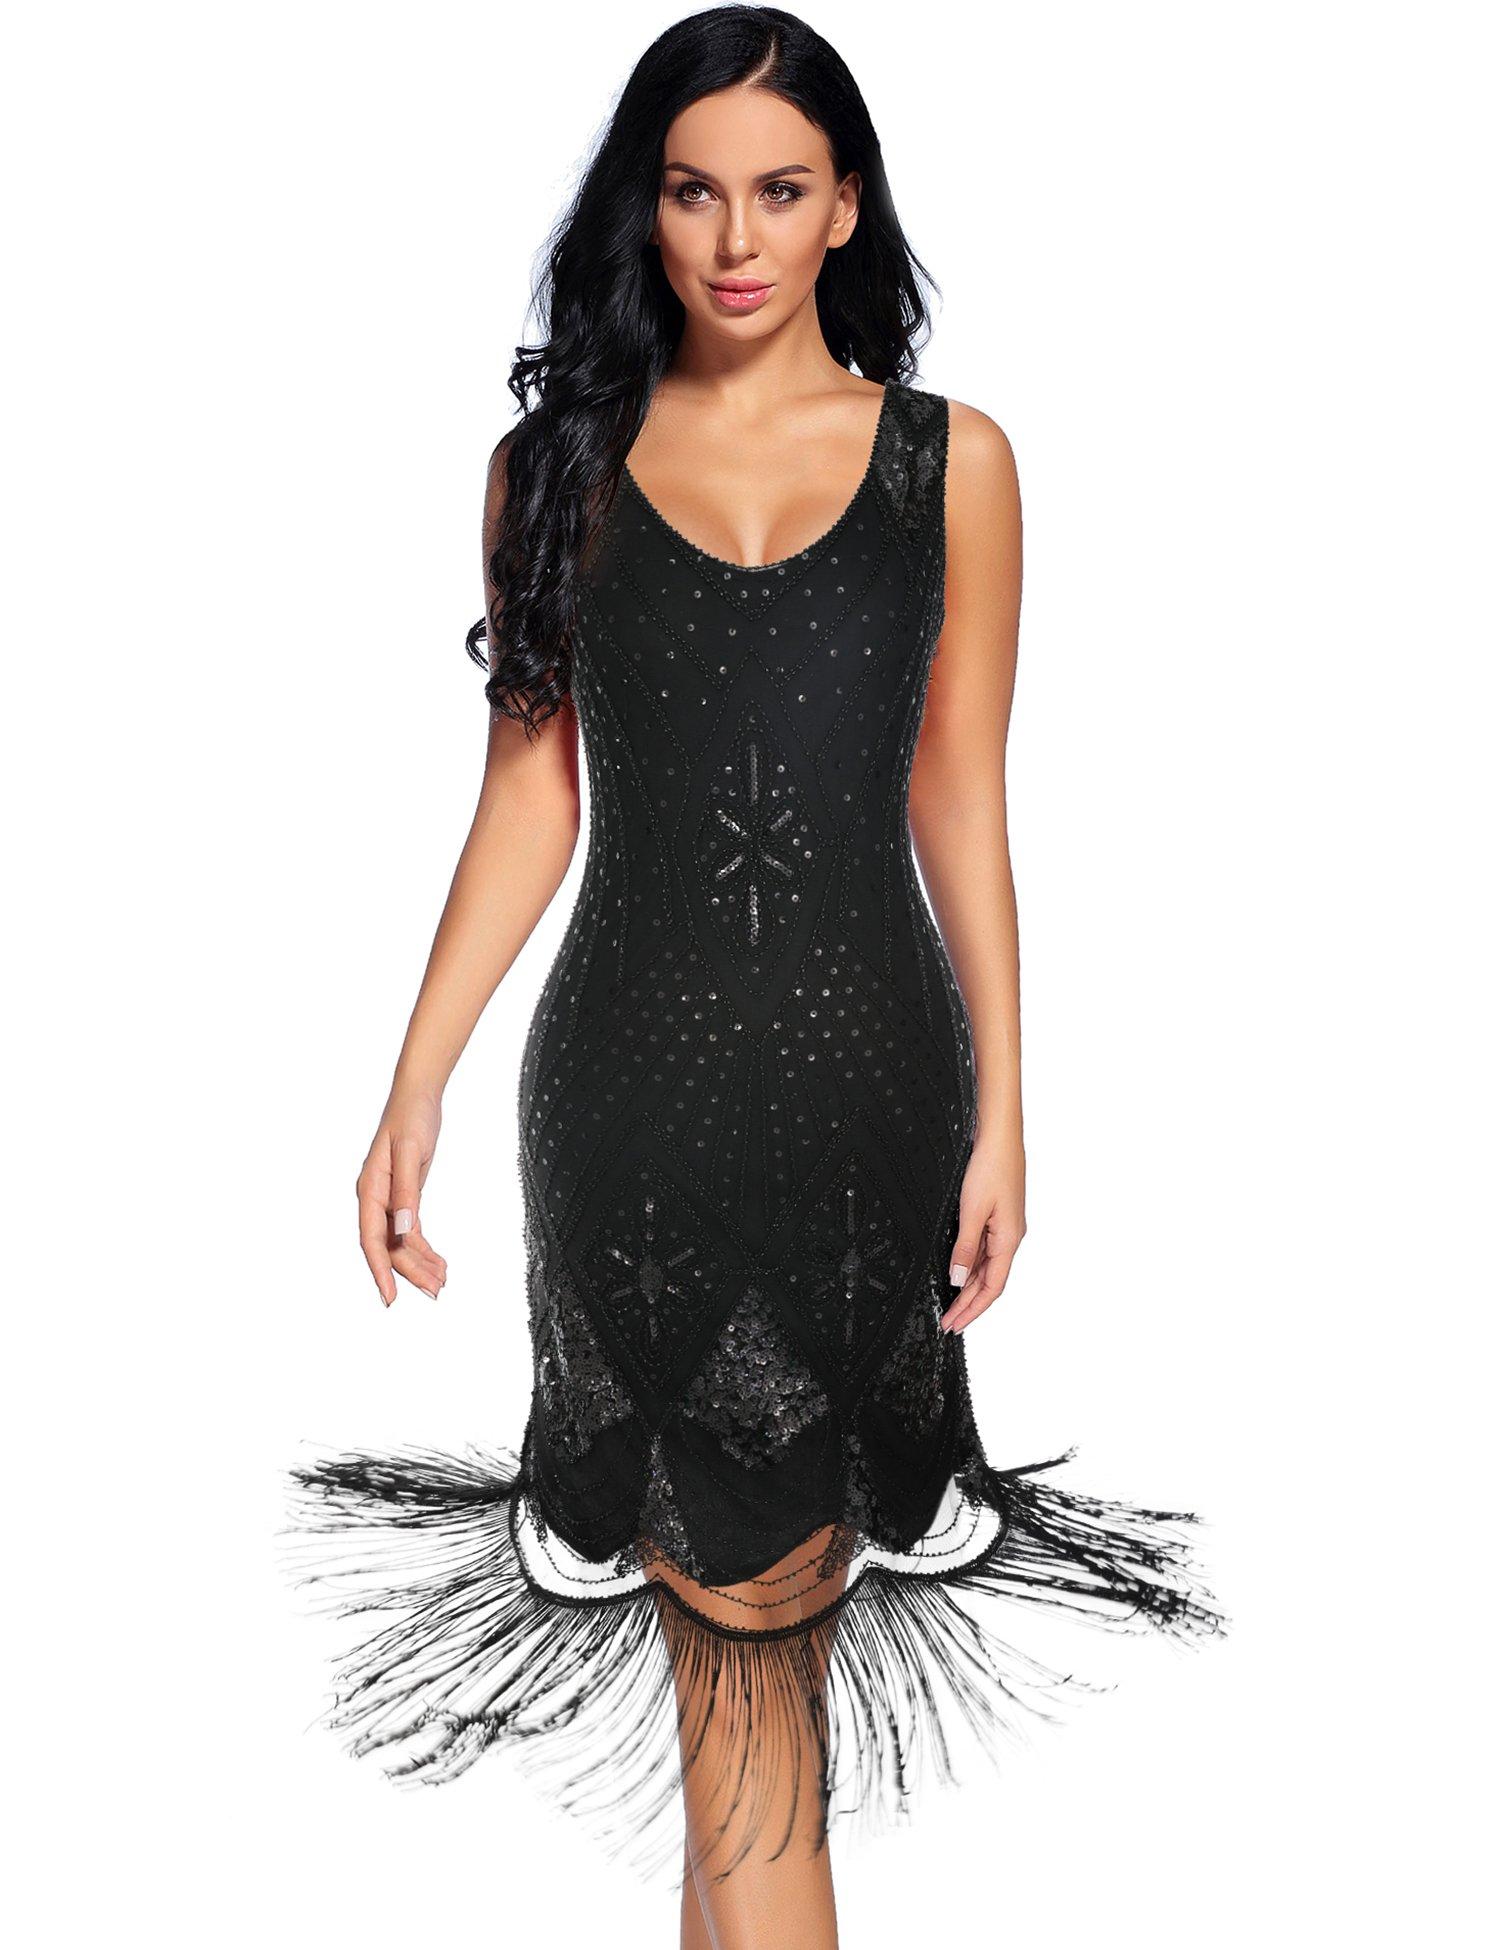 Flapper Girl Women's 1920s Gatsby Cocktail Sequin Art Deco Flapper Dresses (S, Black)